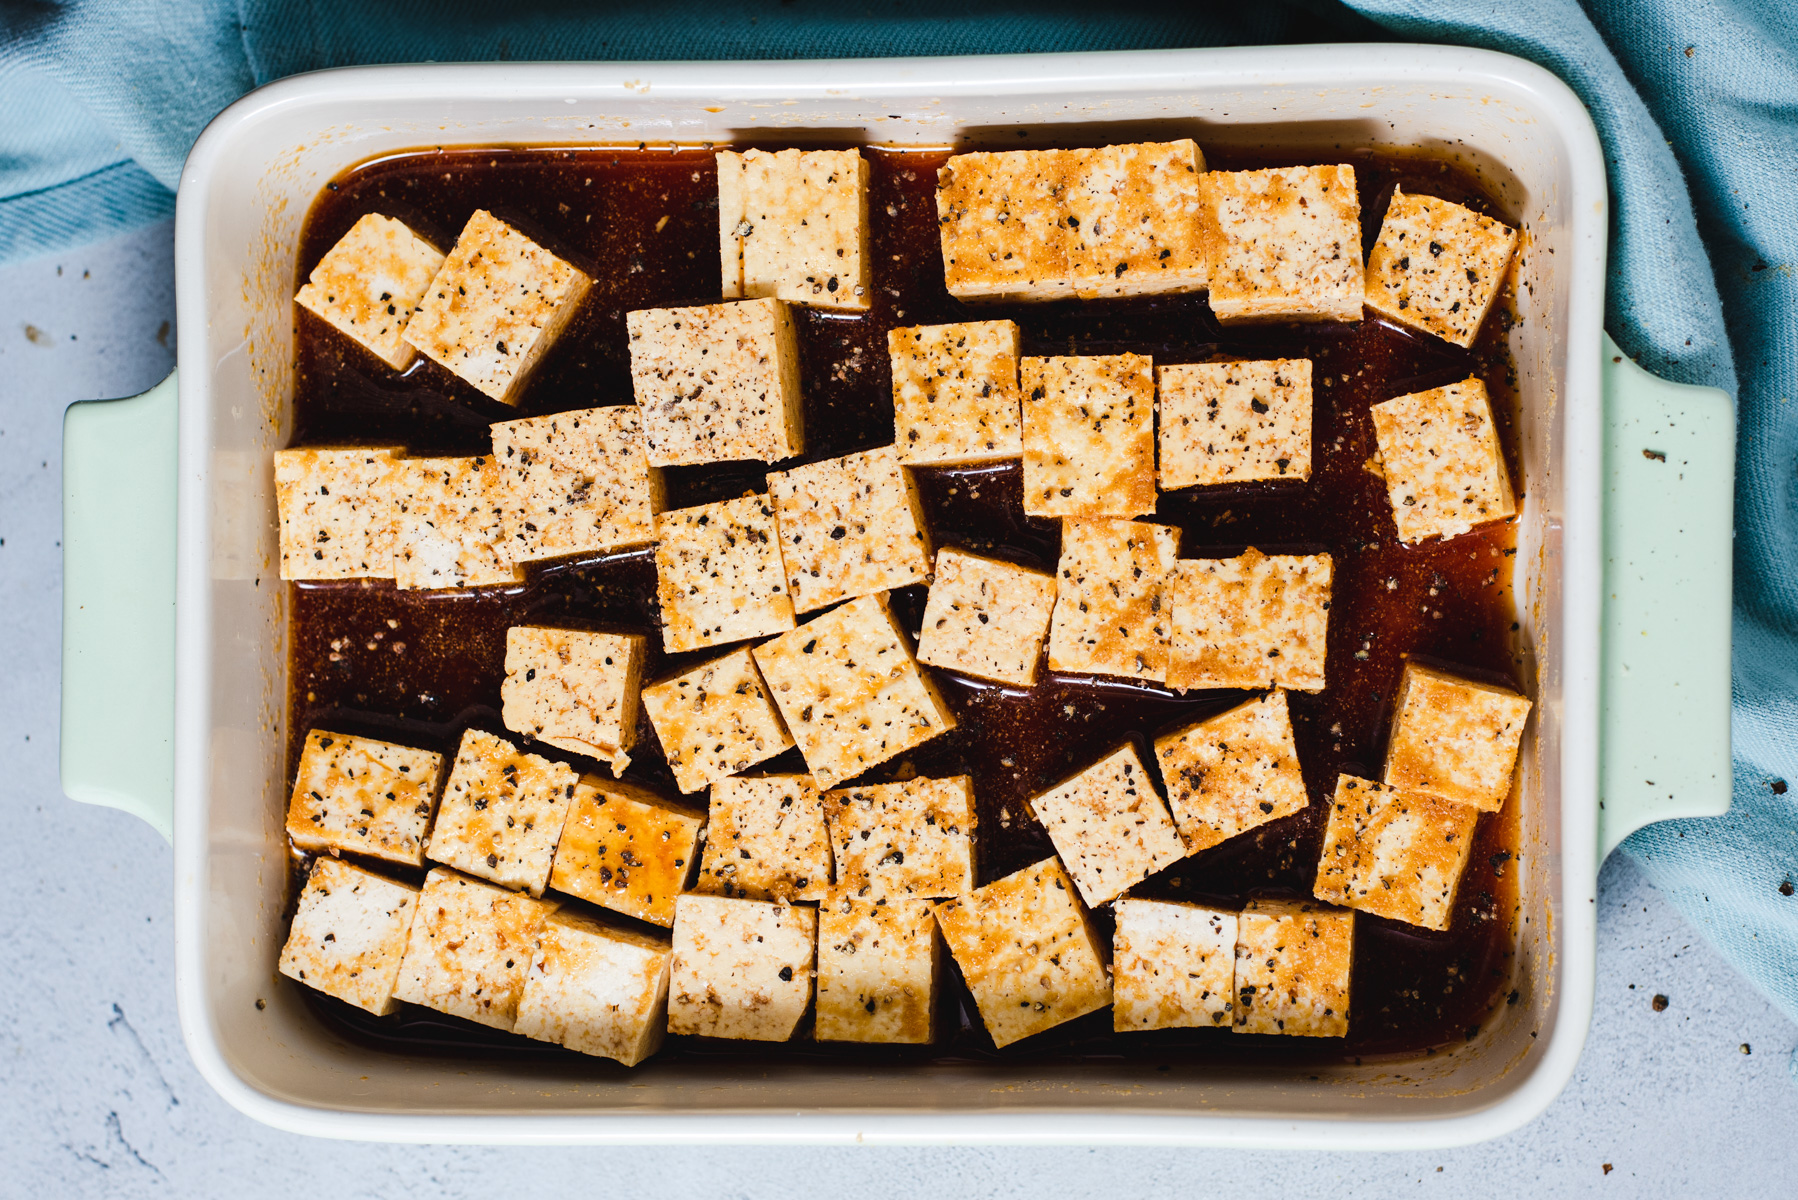 Tofu cubes in brown marinade